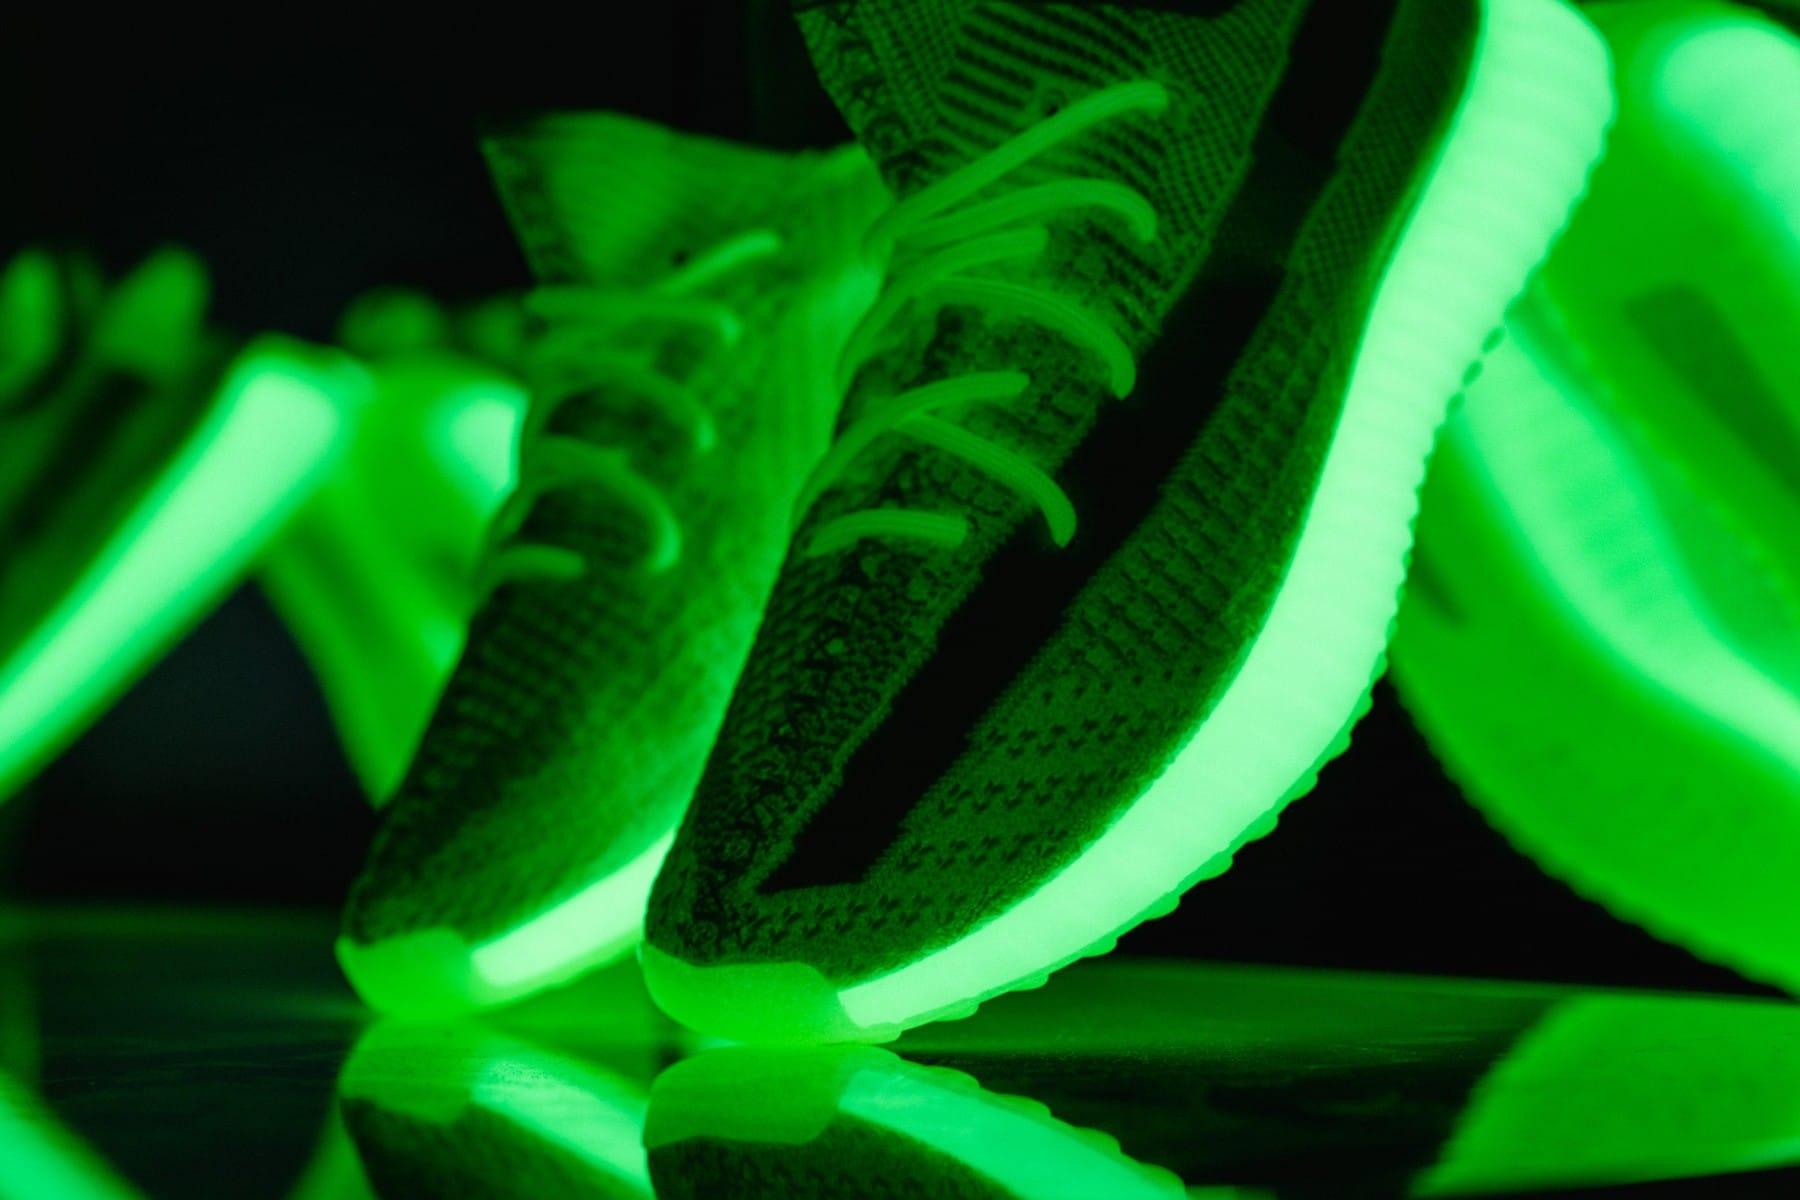 Supreme x Nike 聯乘系列及夜光 YEEZY BOOST 350 V2 等本周不容錯過的 8 項新品發售